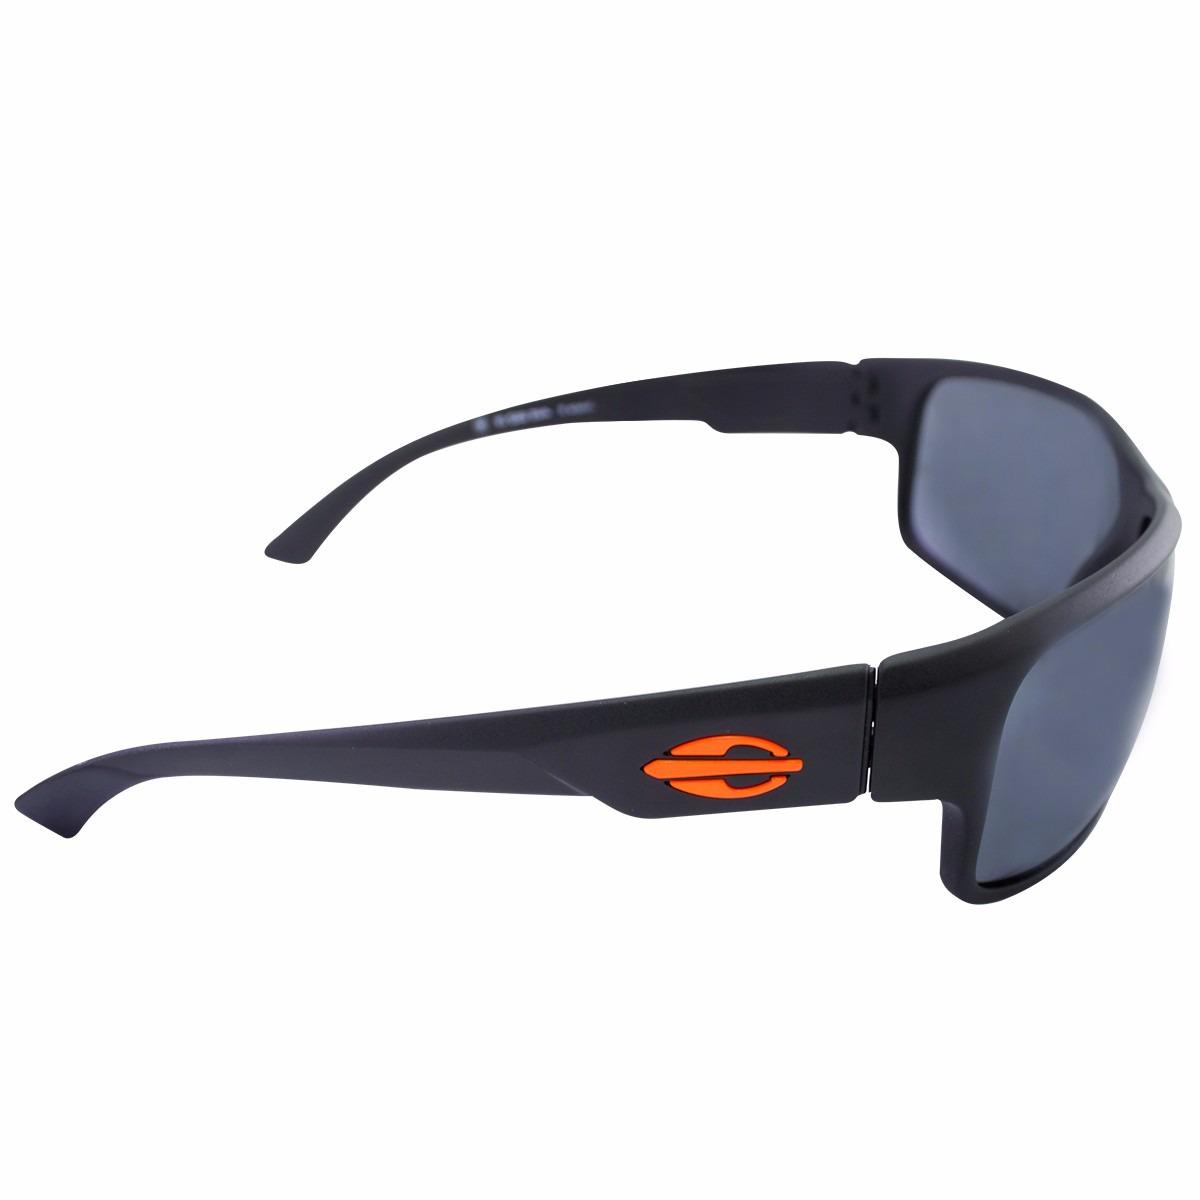 3456a68327bee óculos mormaii joaca 2 preto fosco  lente cinza logo laranja. Carregando  zoom.